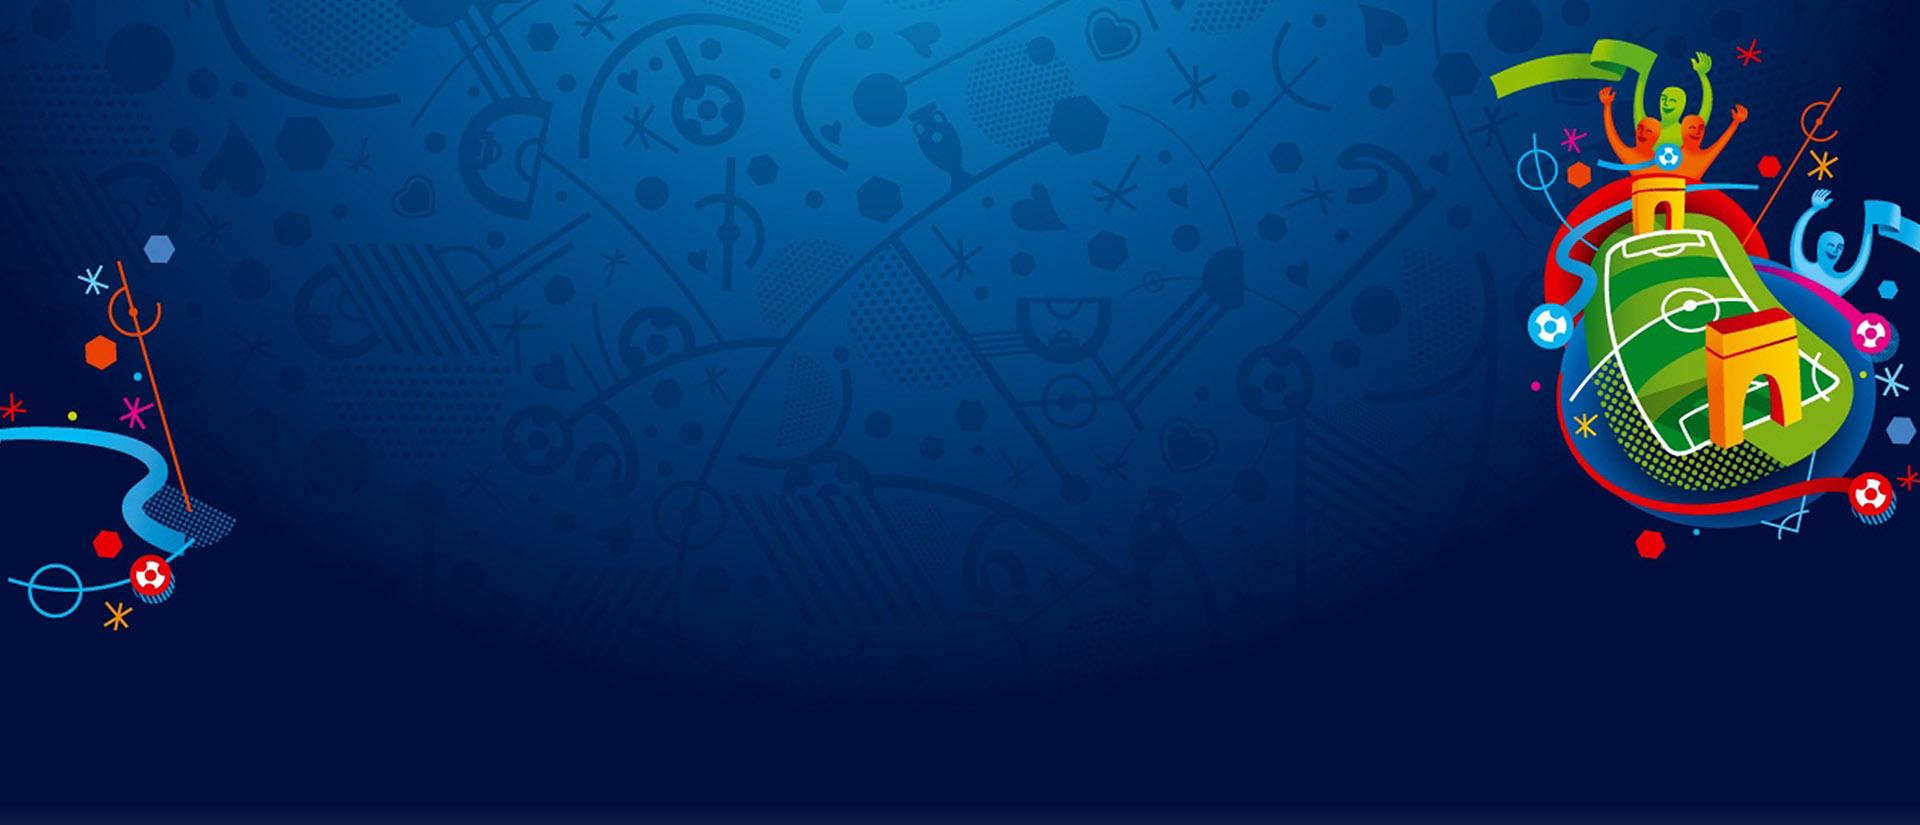 Diseño Arte Patrón Fondos De Pantalla Antecedentes: Fondos De Pantalla Diseño Arte Graphic Antecedentes